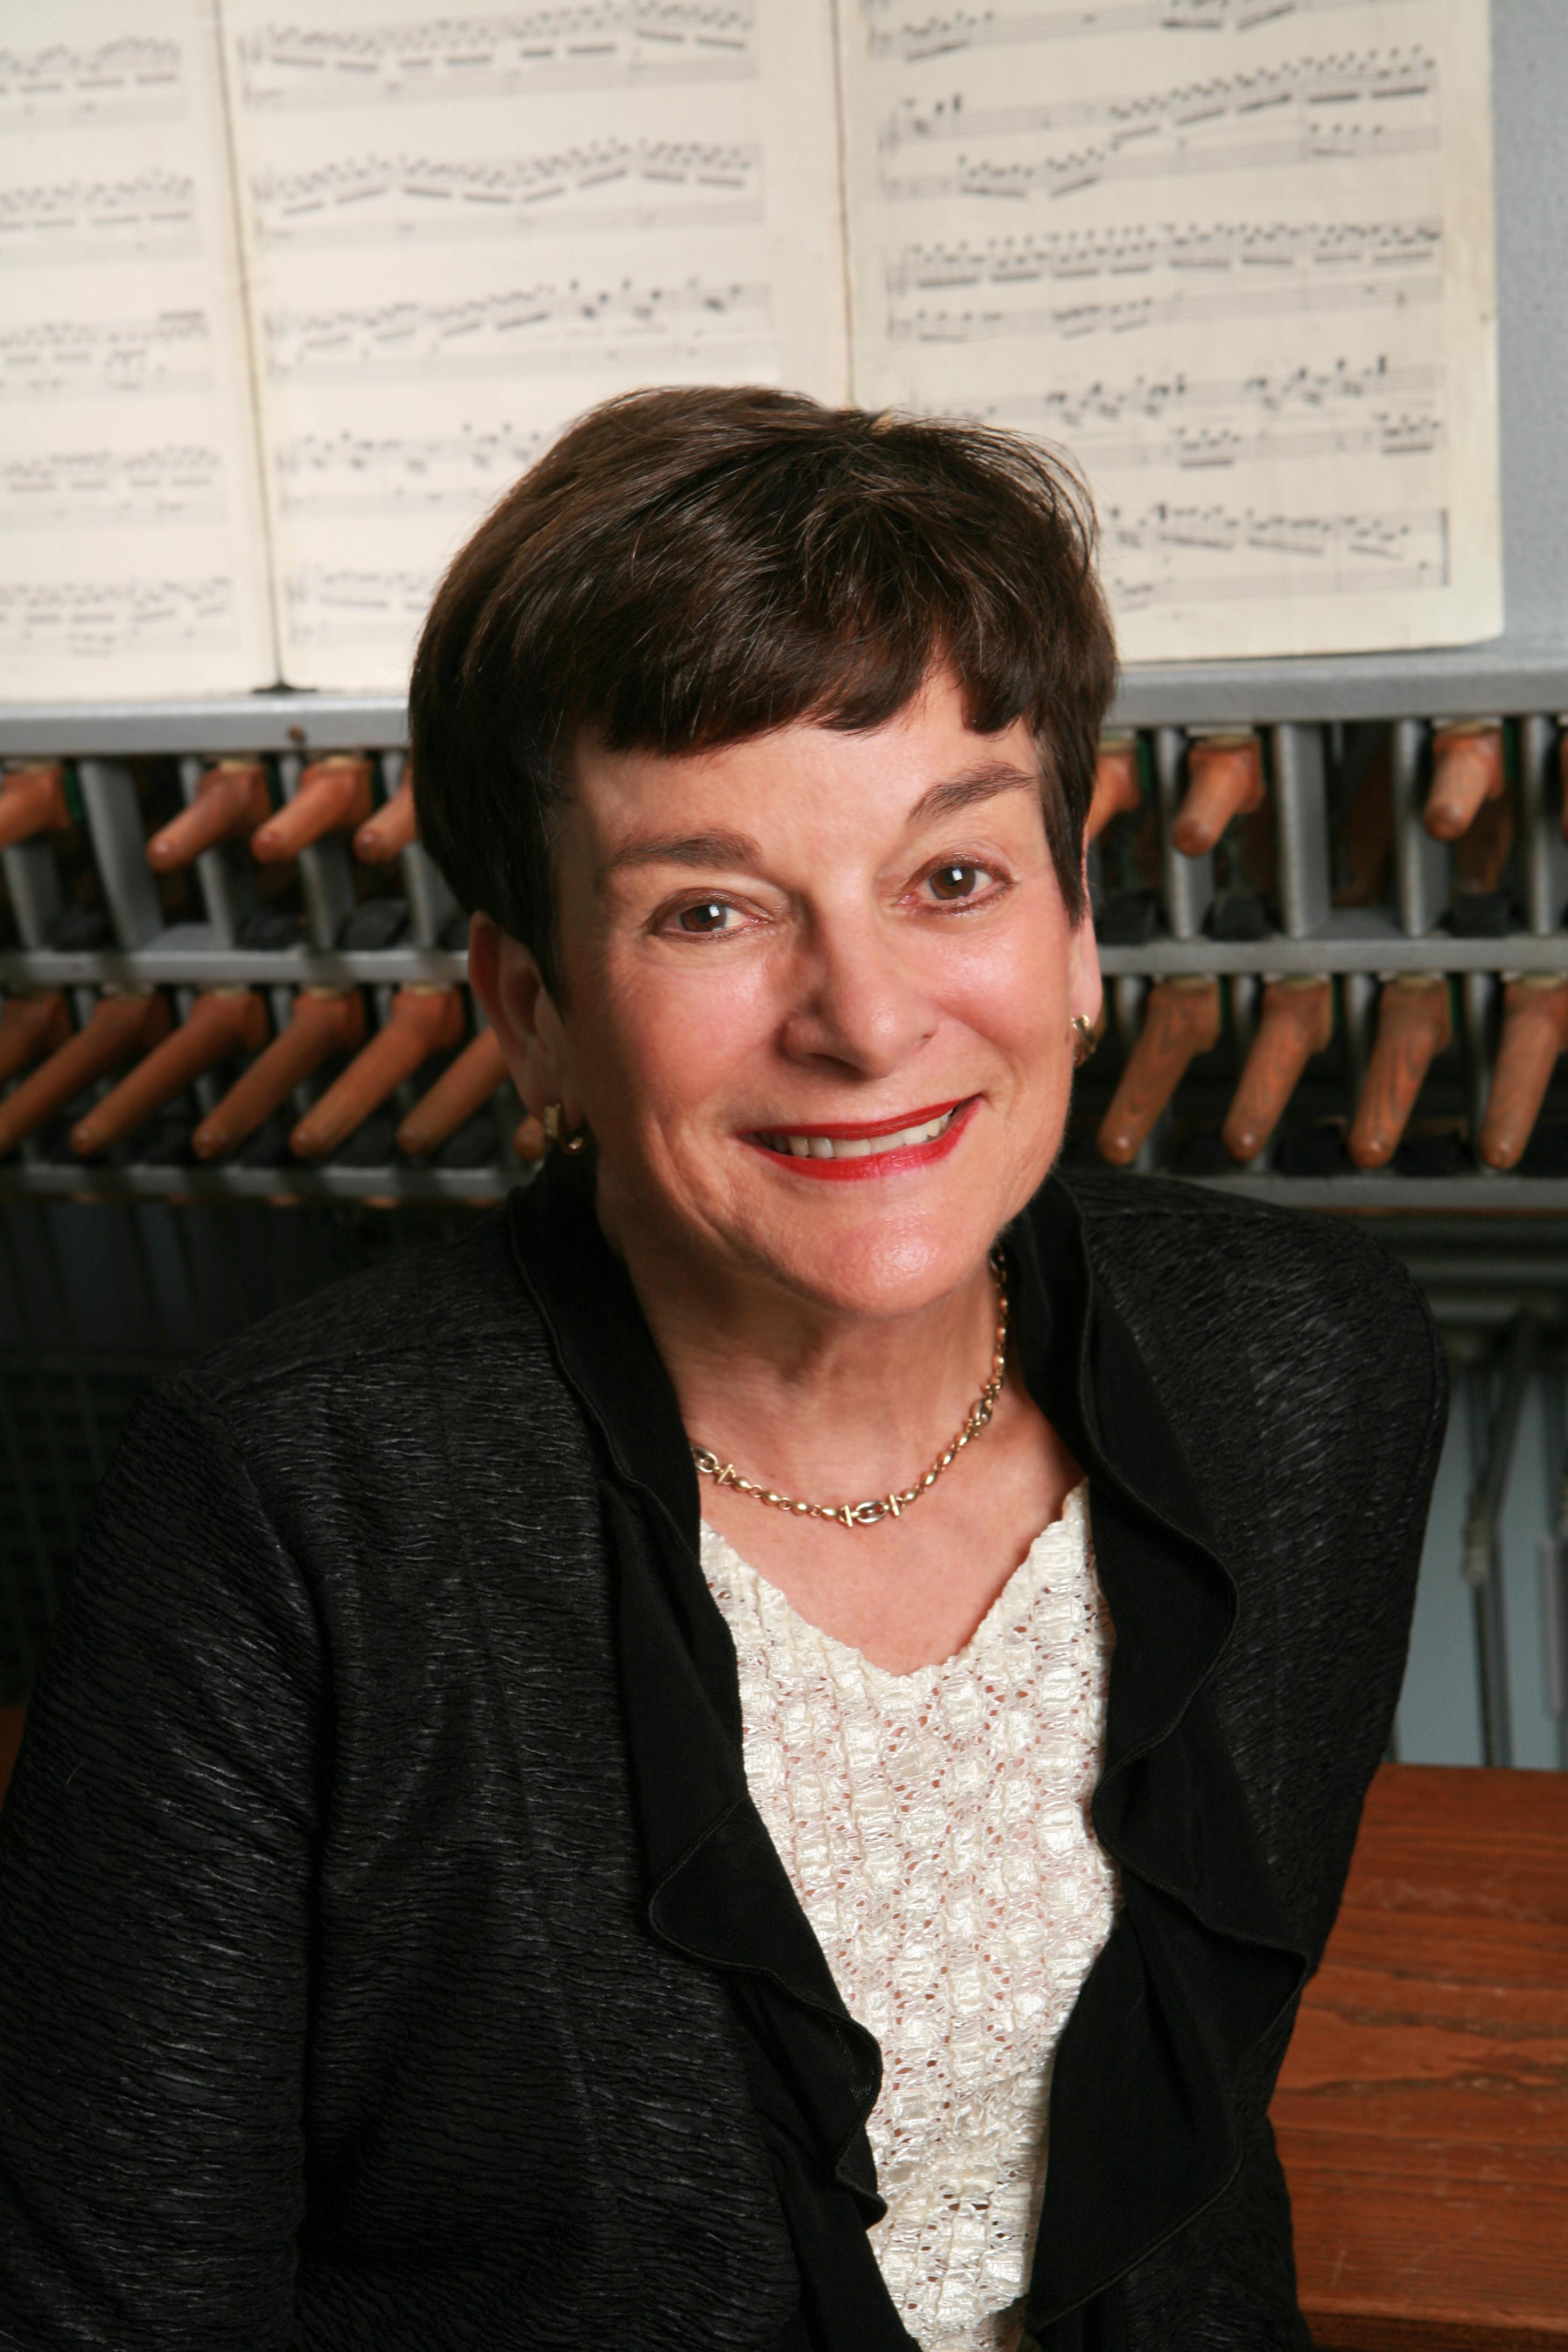 Margo Halsted